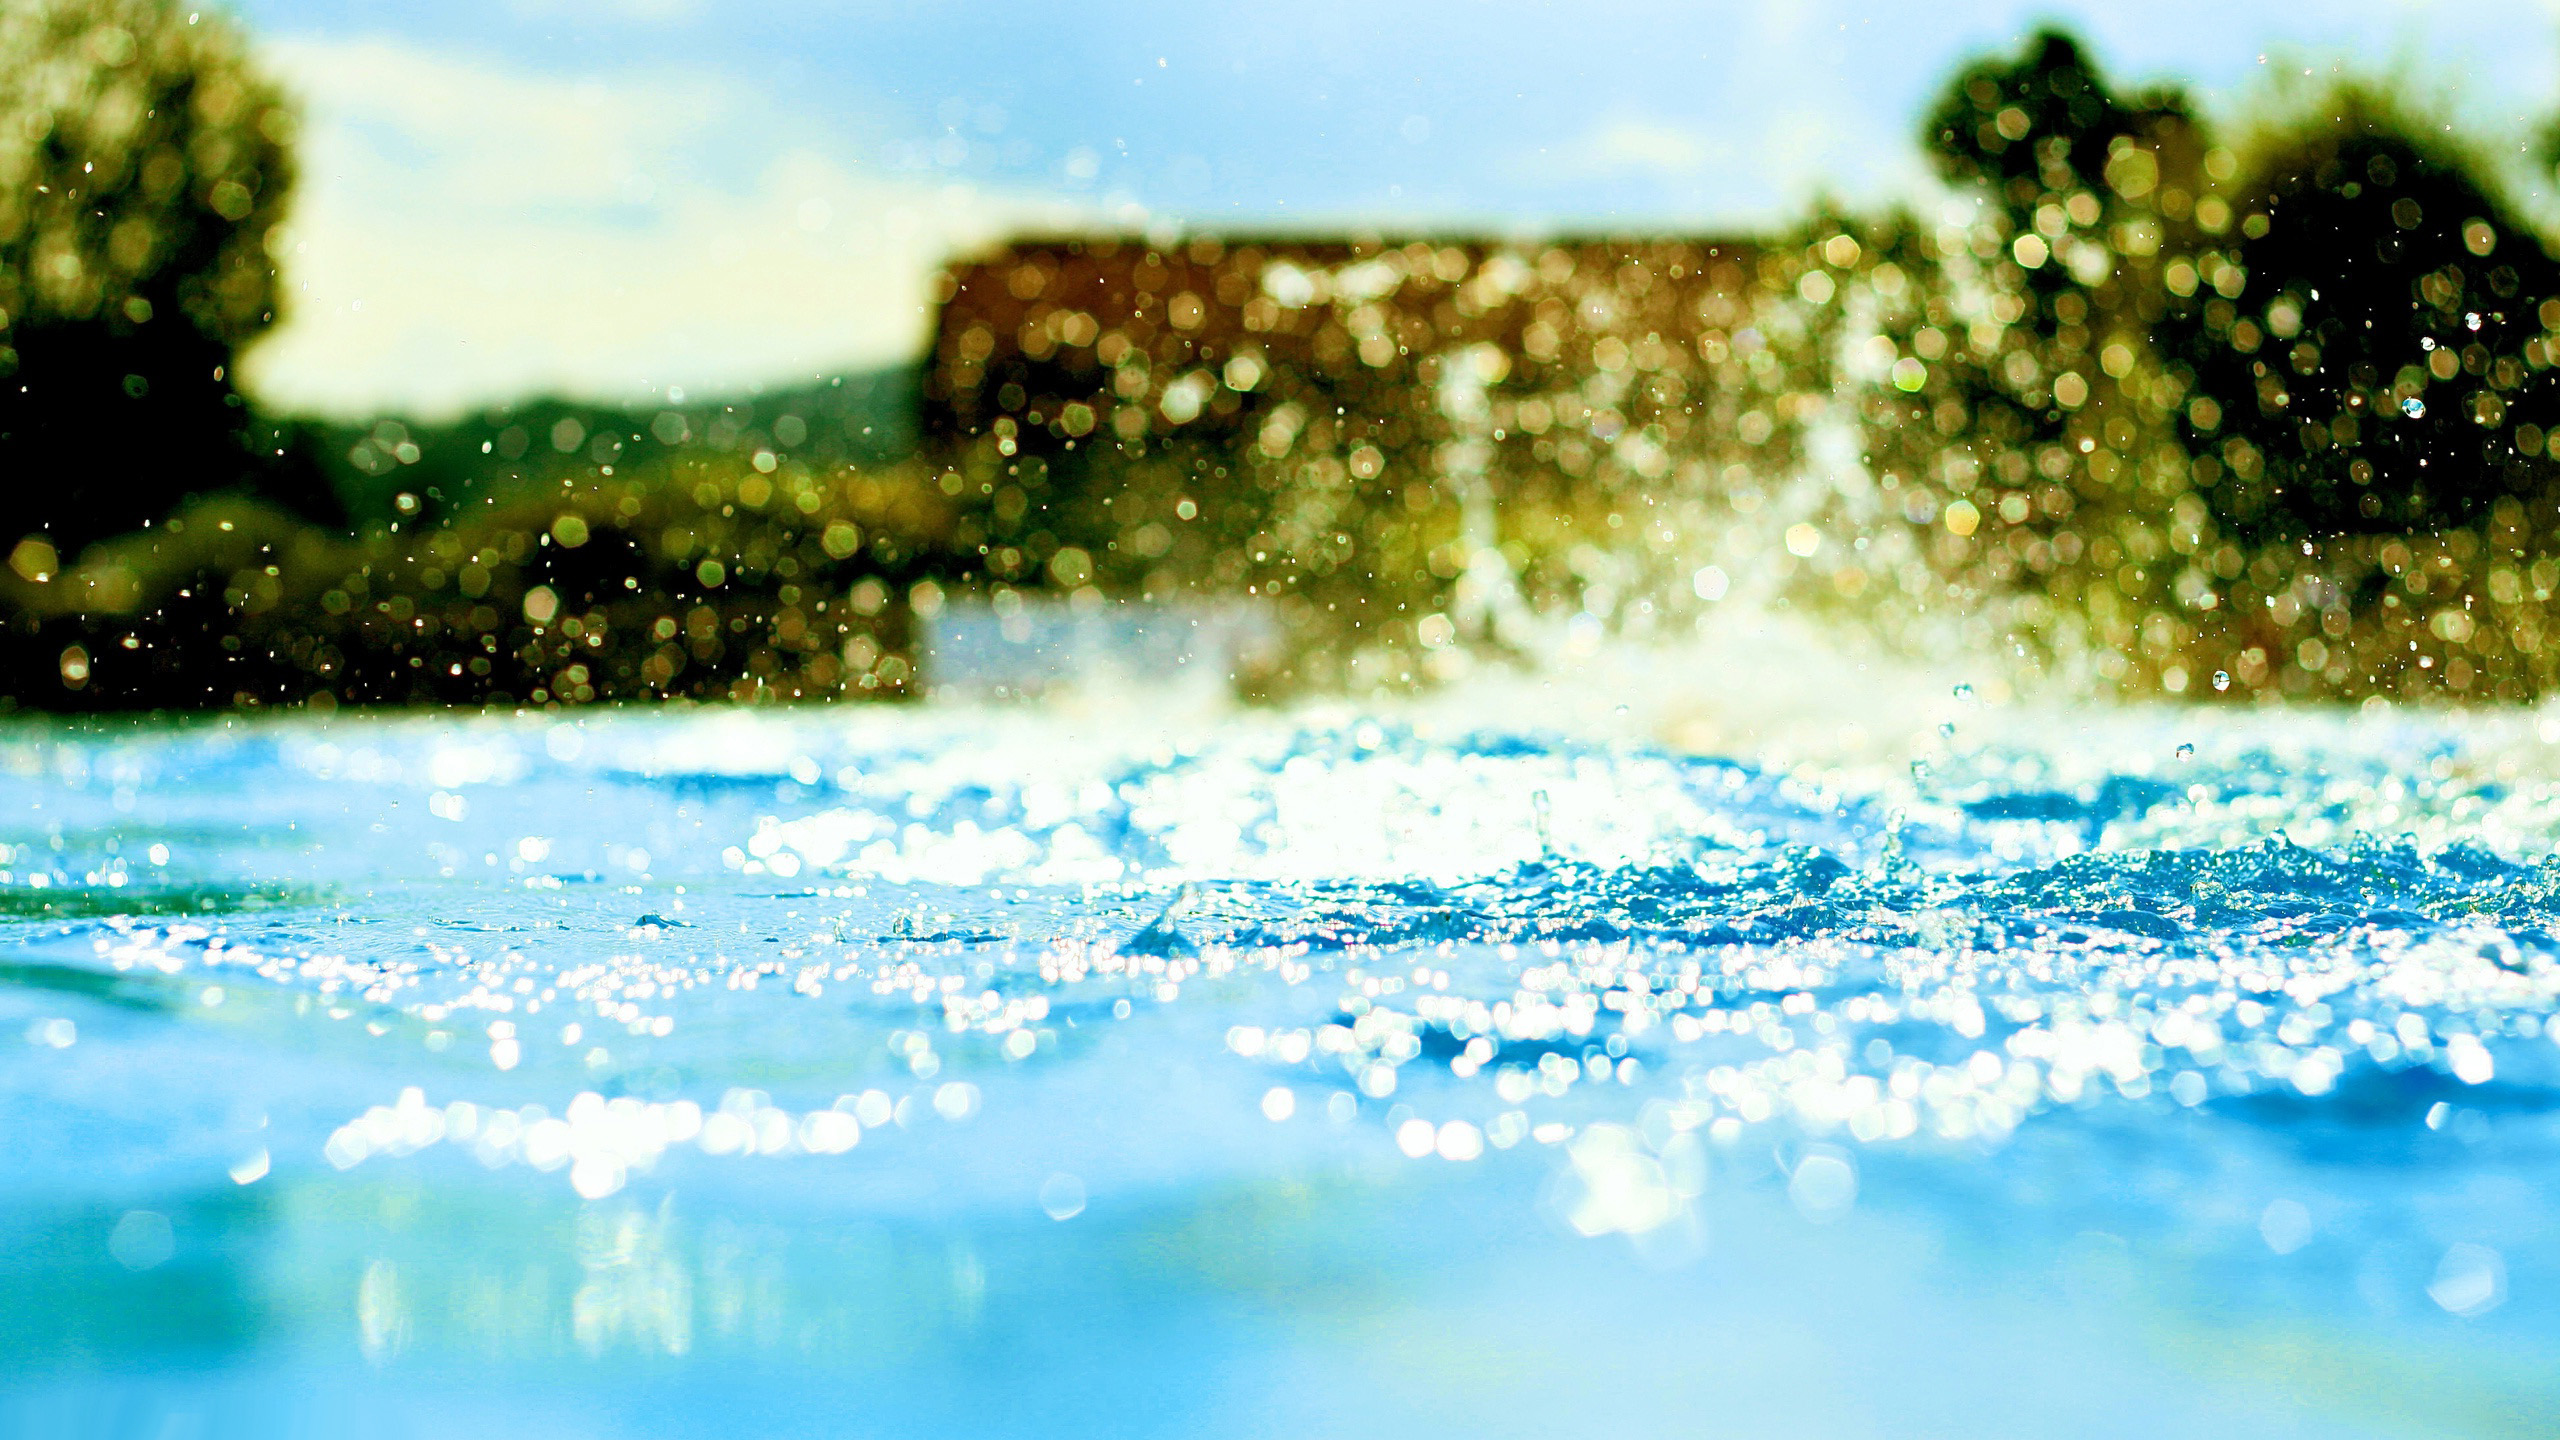 Summertime · Summertime · Summertime Wallpaper ...